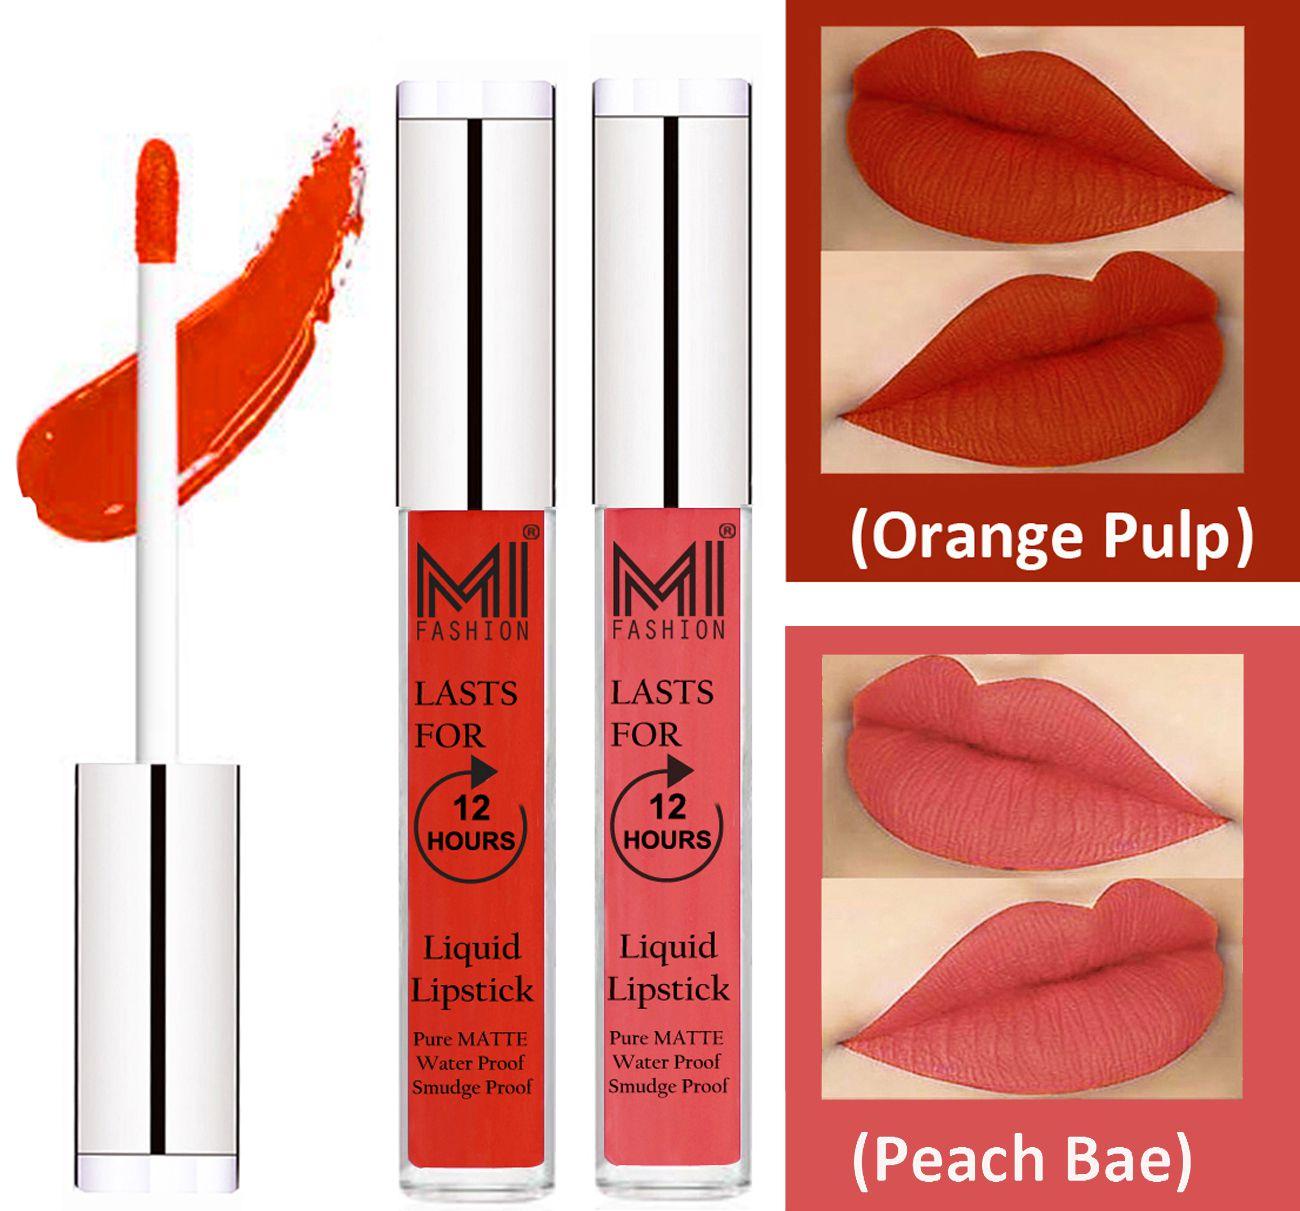 MI FASHION Liquid Lipstick Orange Pulp,Peach Bae Pack of 2